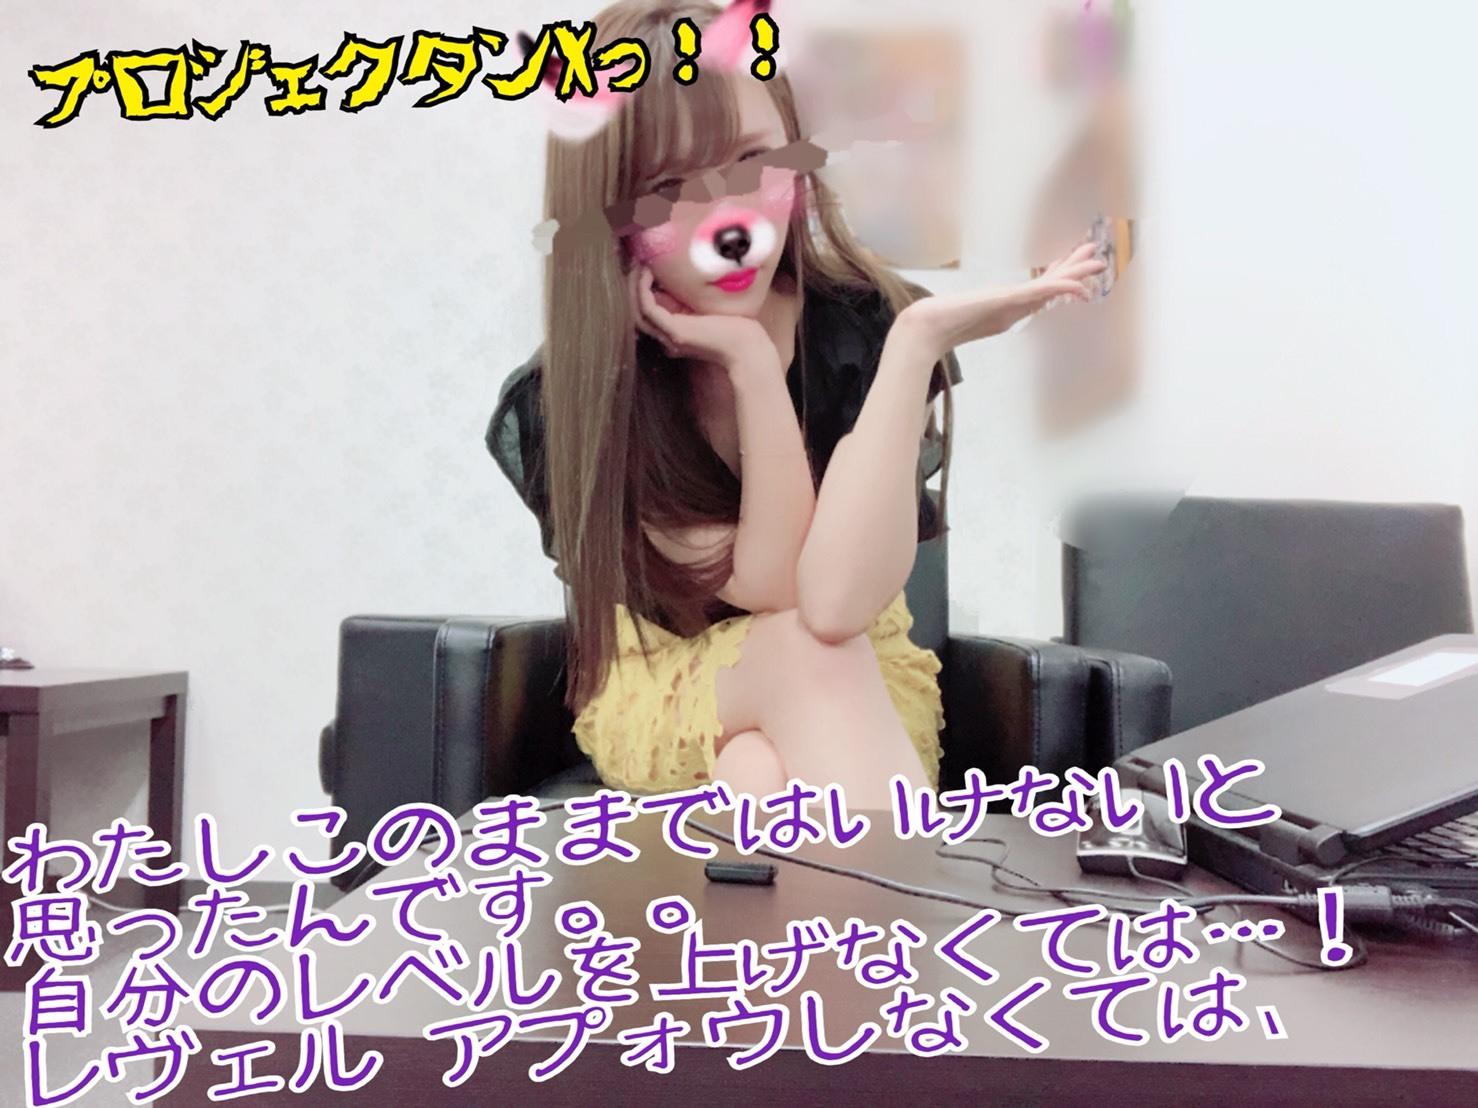 S__17563651.jpg